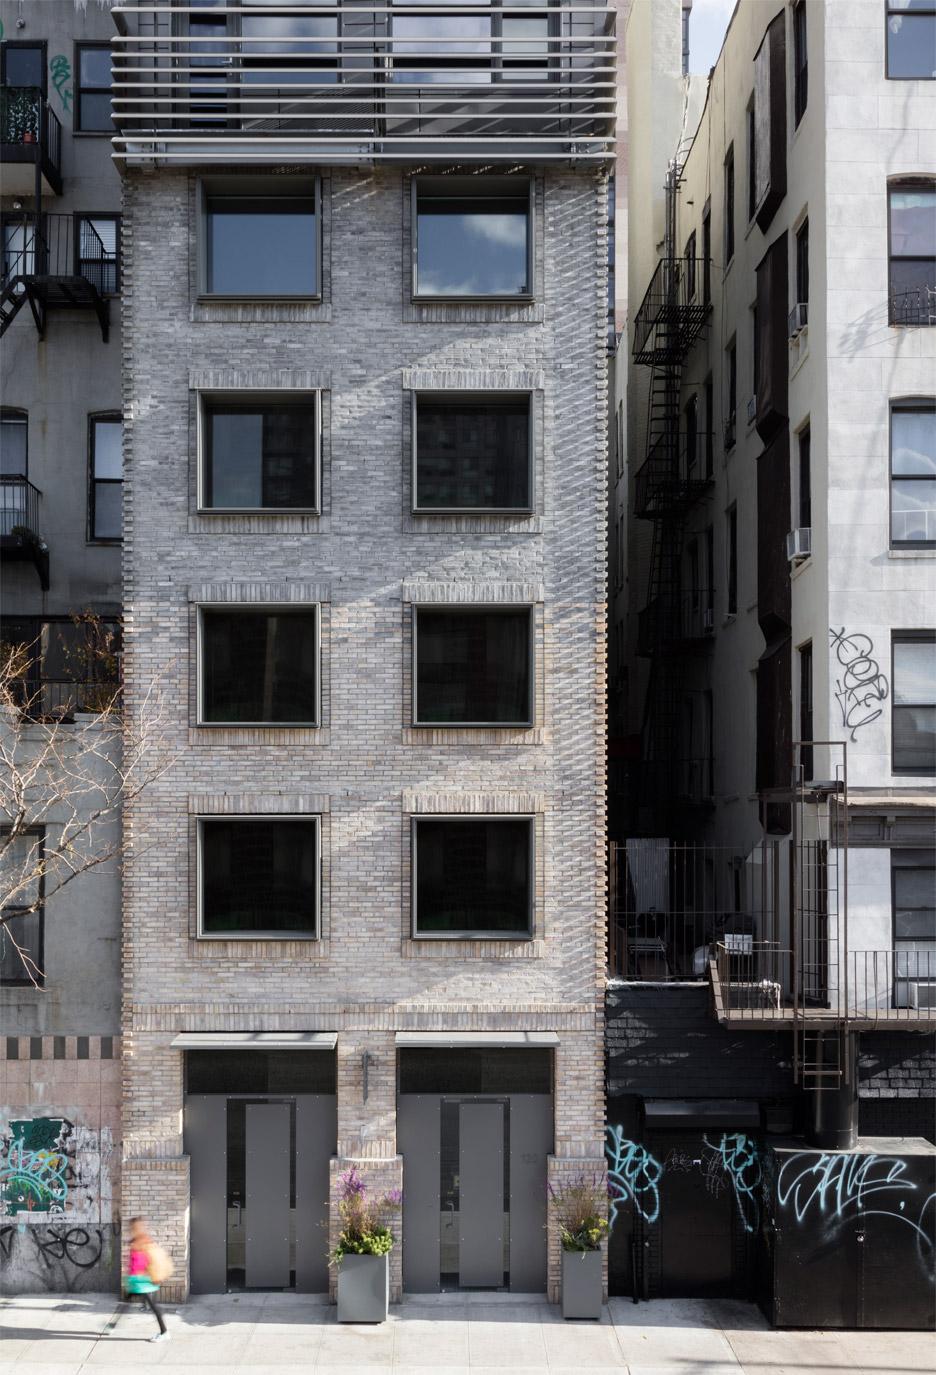 120 Allen Street, apartment block in New York City, USA